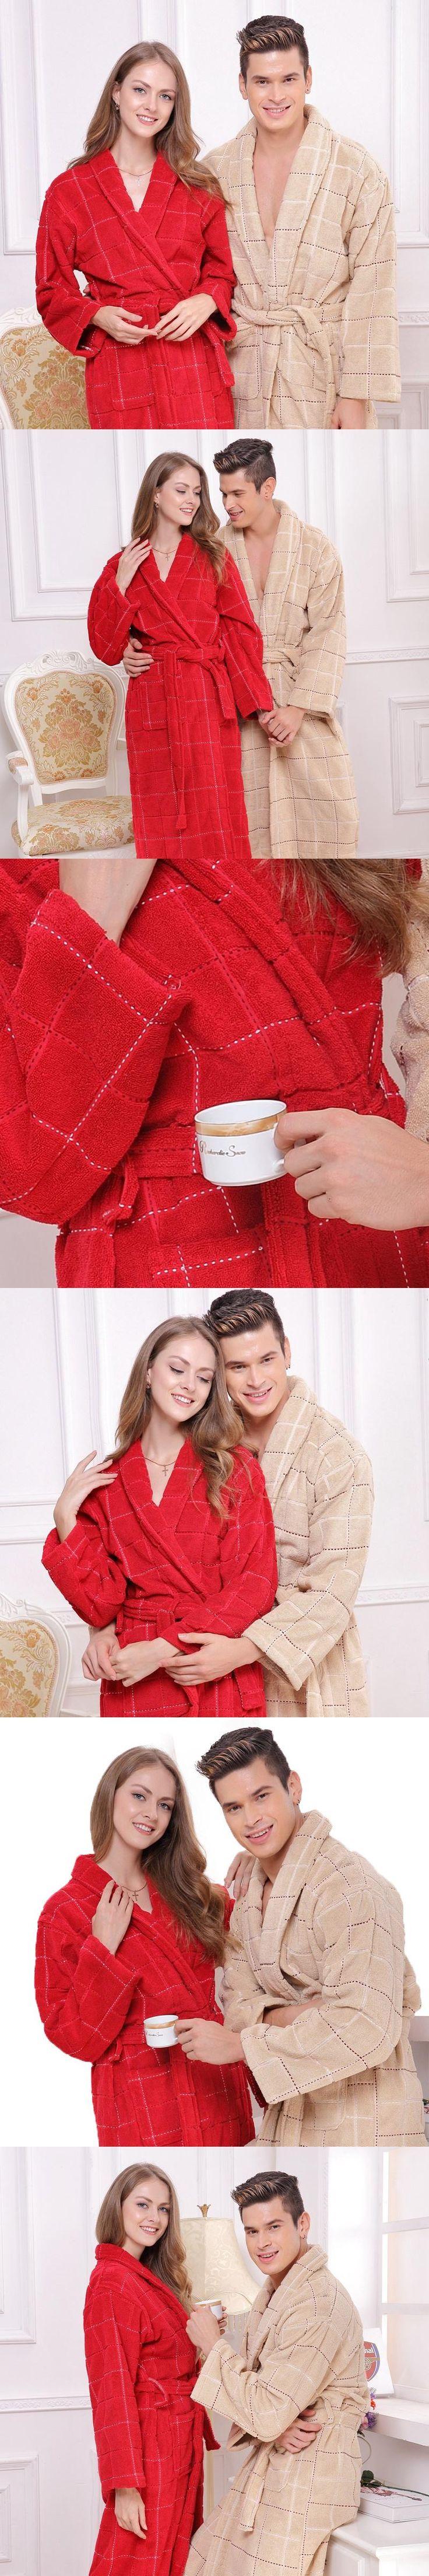 Cotton bathrobe men plus size XXL pajamas women sleepwear nightgown thicken long soft towel fleece loves autumn winer red khaki